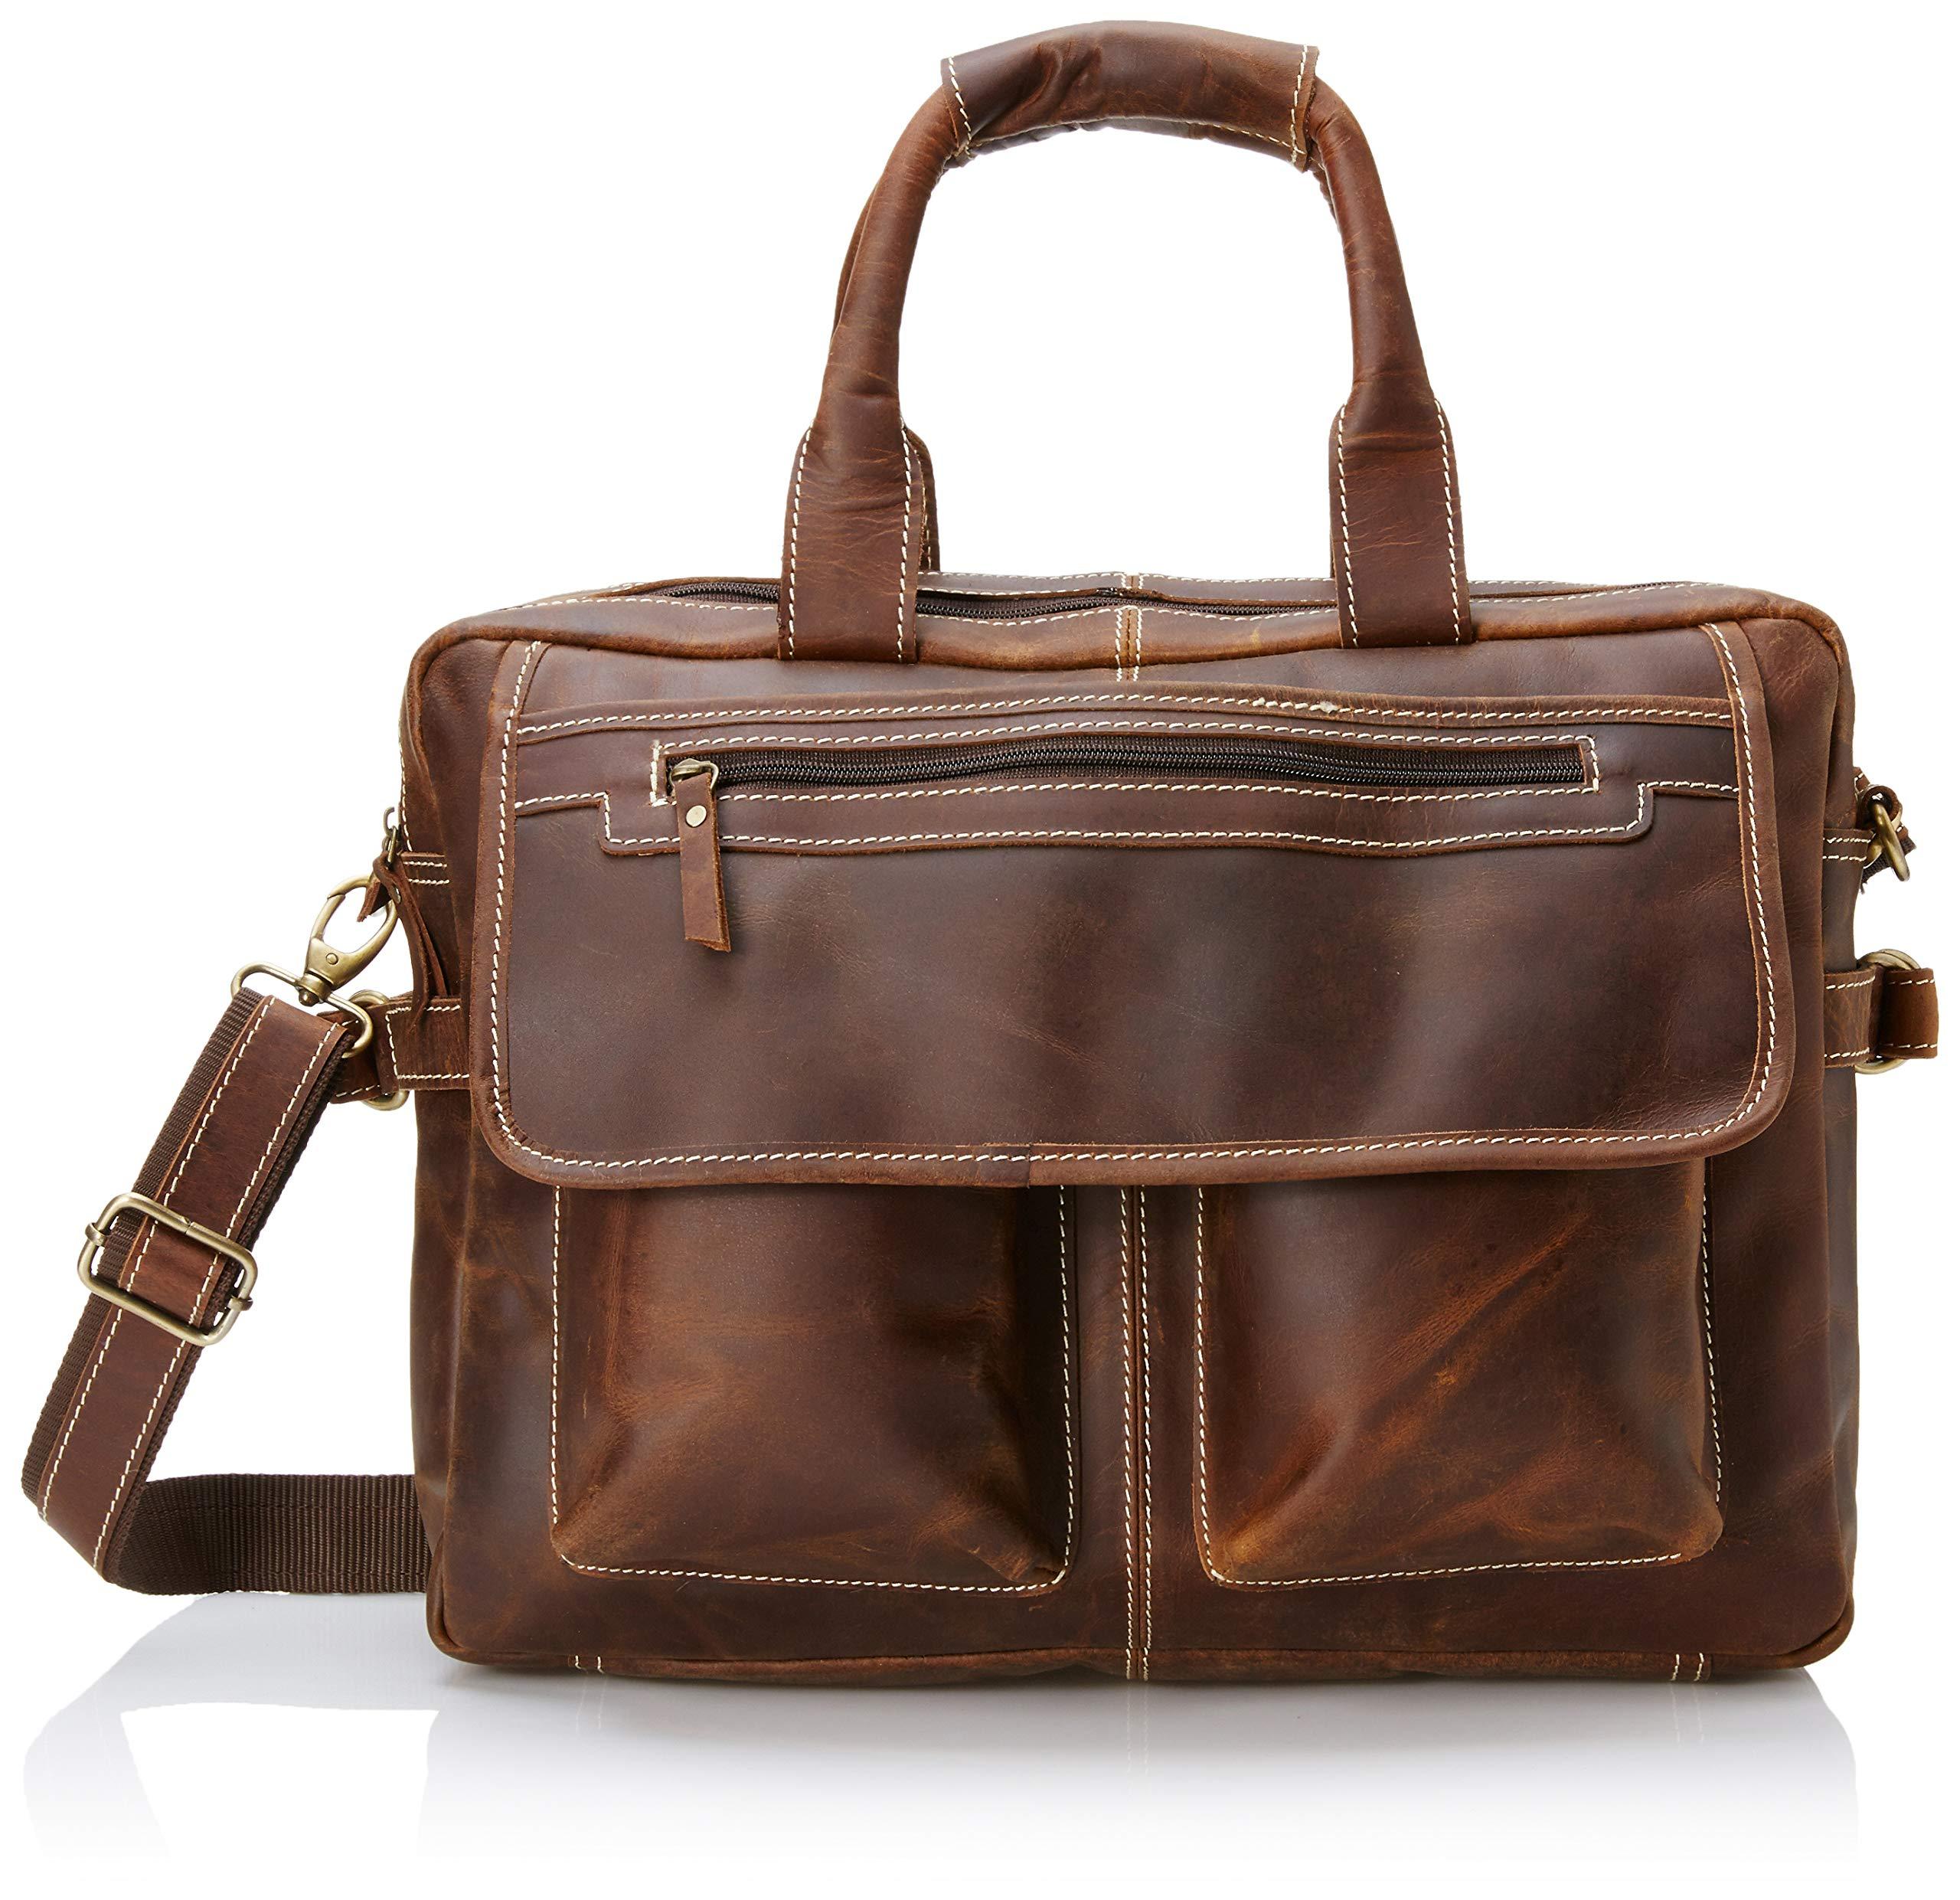 16 inch Vintage Buffalo Leather Messenger Satchel Laptop Briefcase Men's Bag Crazy Vintage Leather Messenger (Brown) by Ruzioon (Image #1)